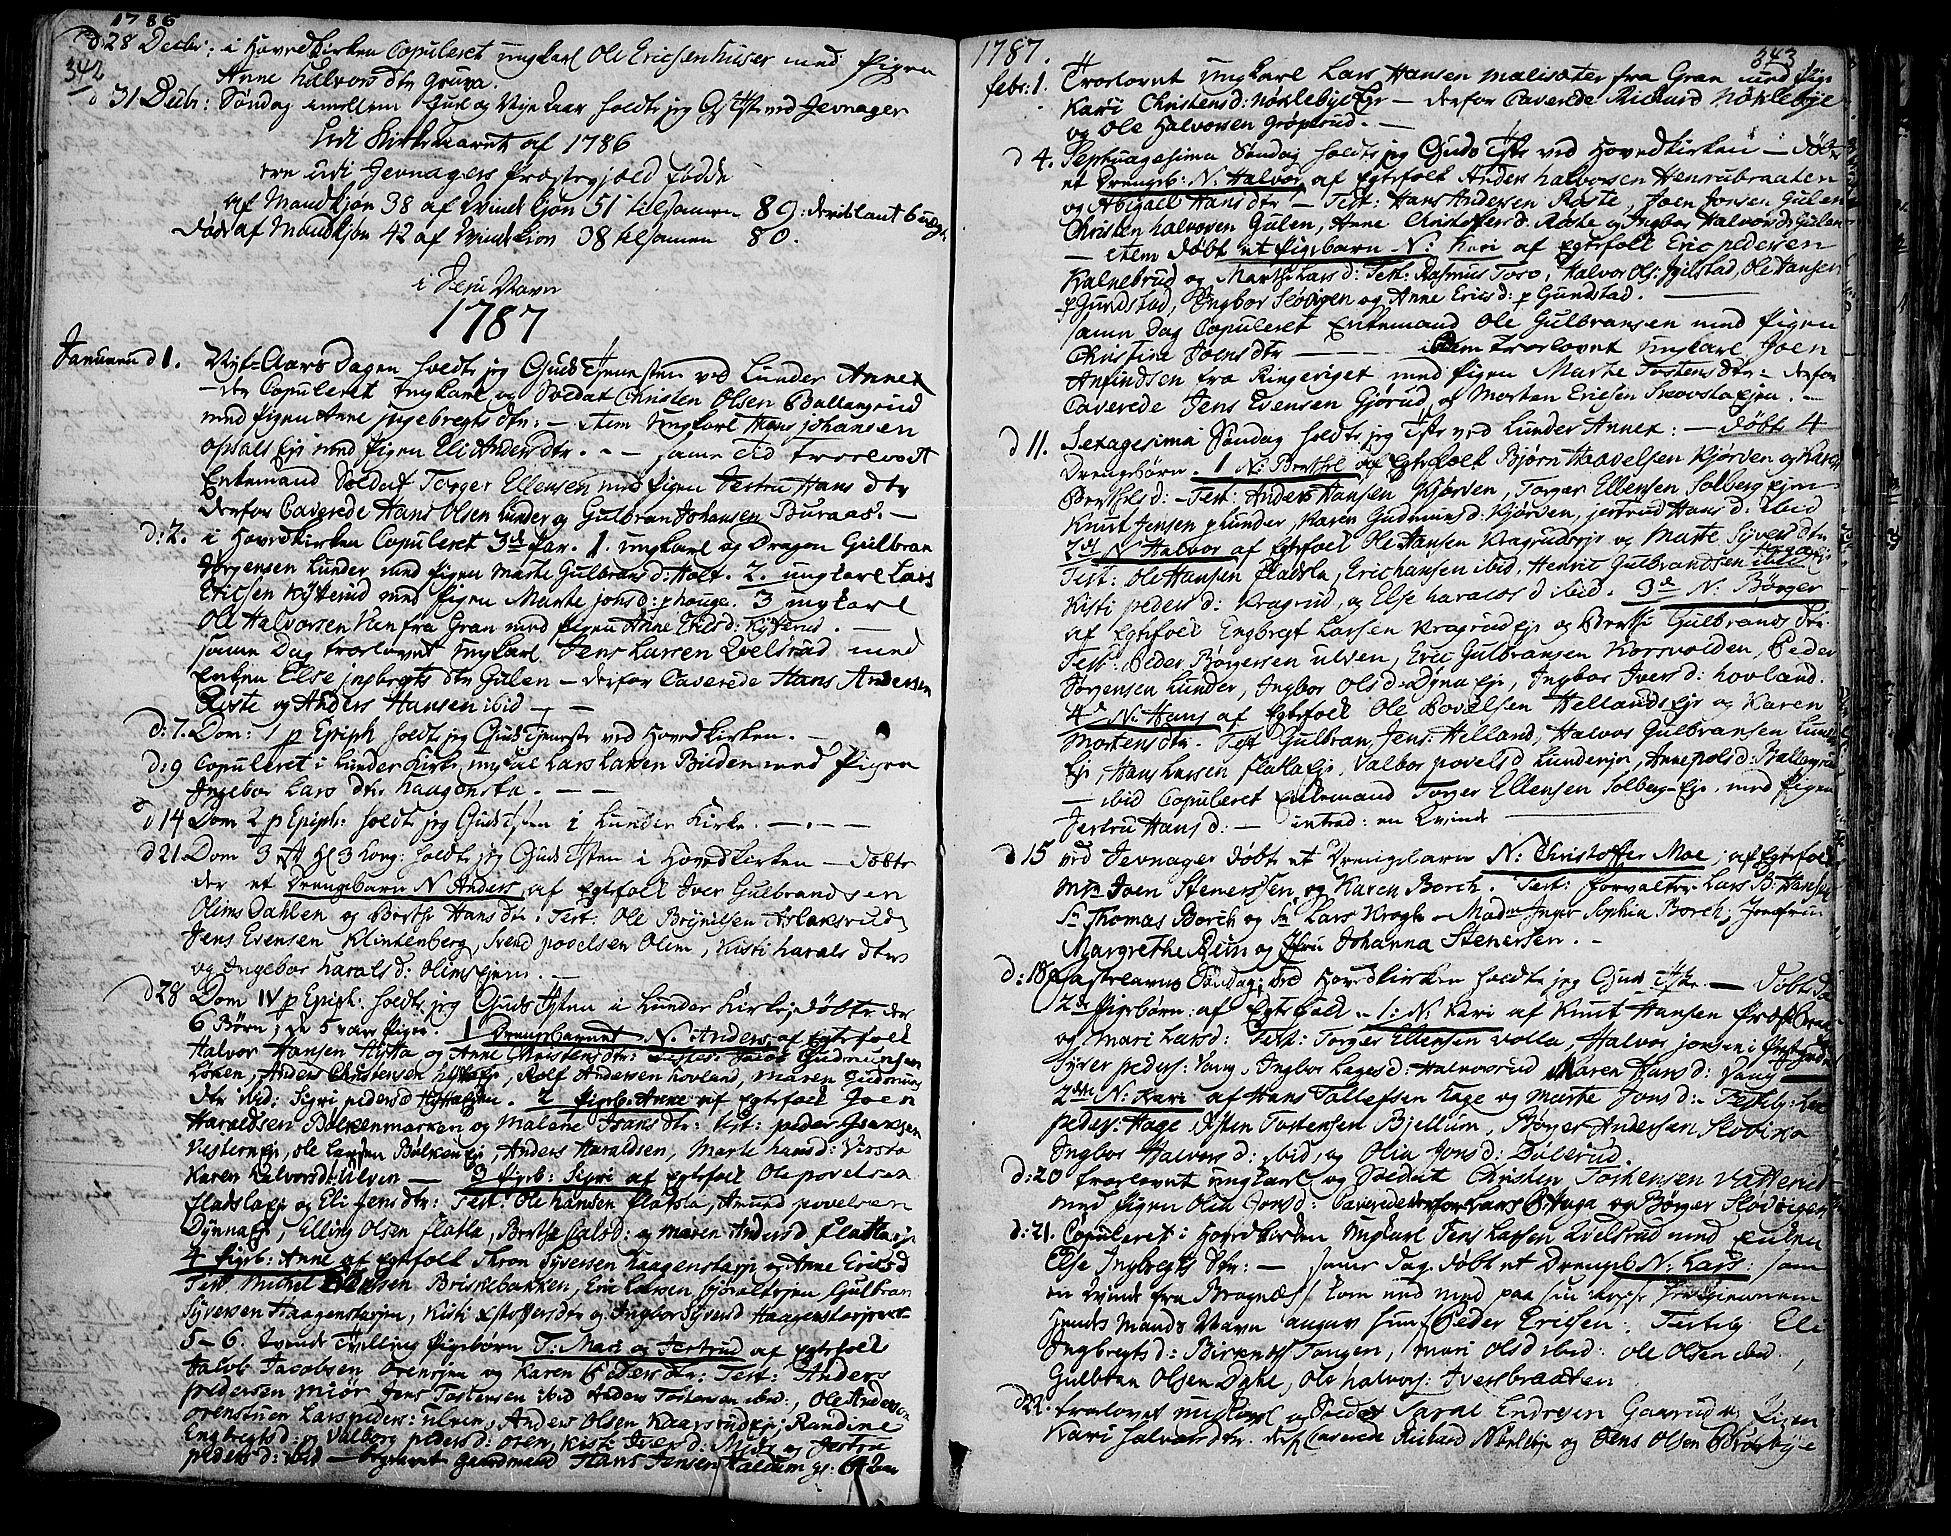 SAH, Jevnaker prestekontor, Ministerialbok nr. 3, 1752-1799, s. 342-343